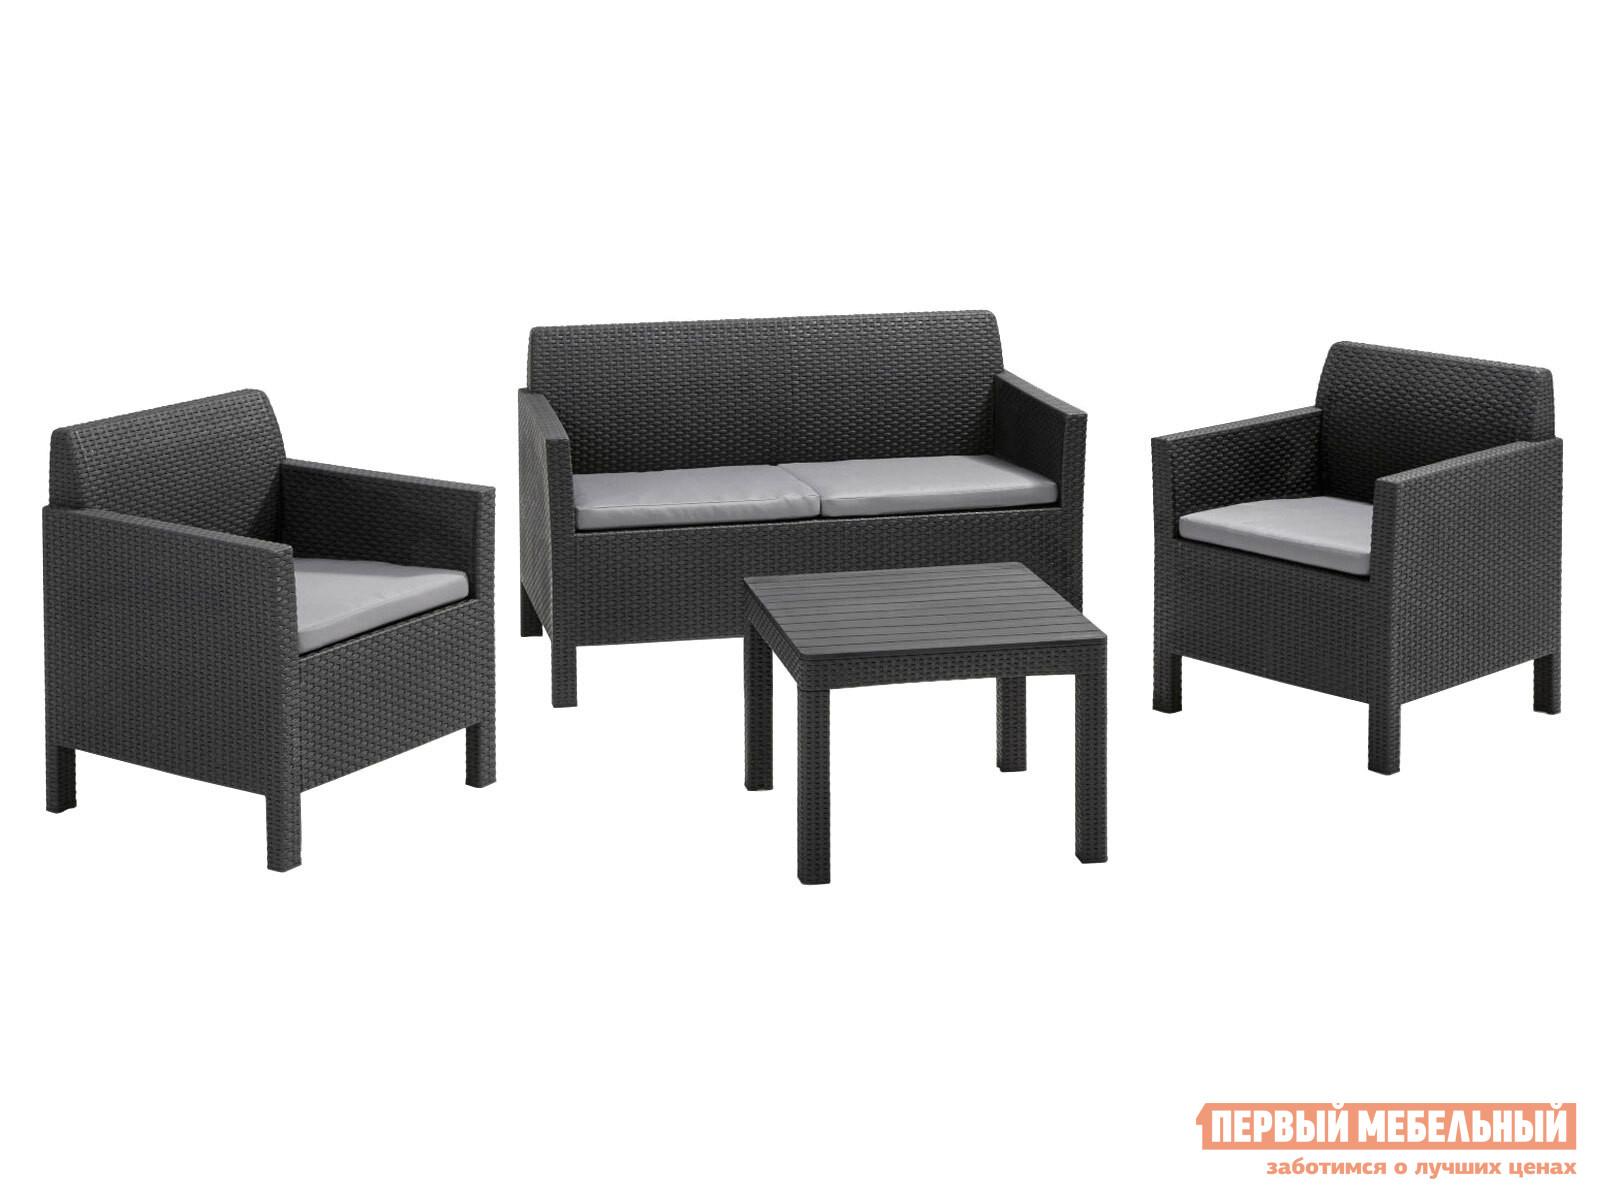 Комплект садовой мебели Keter 17202809 Комплект мебели Orlando set with small table